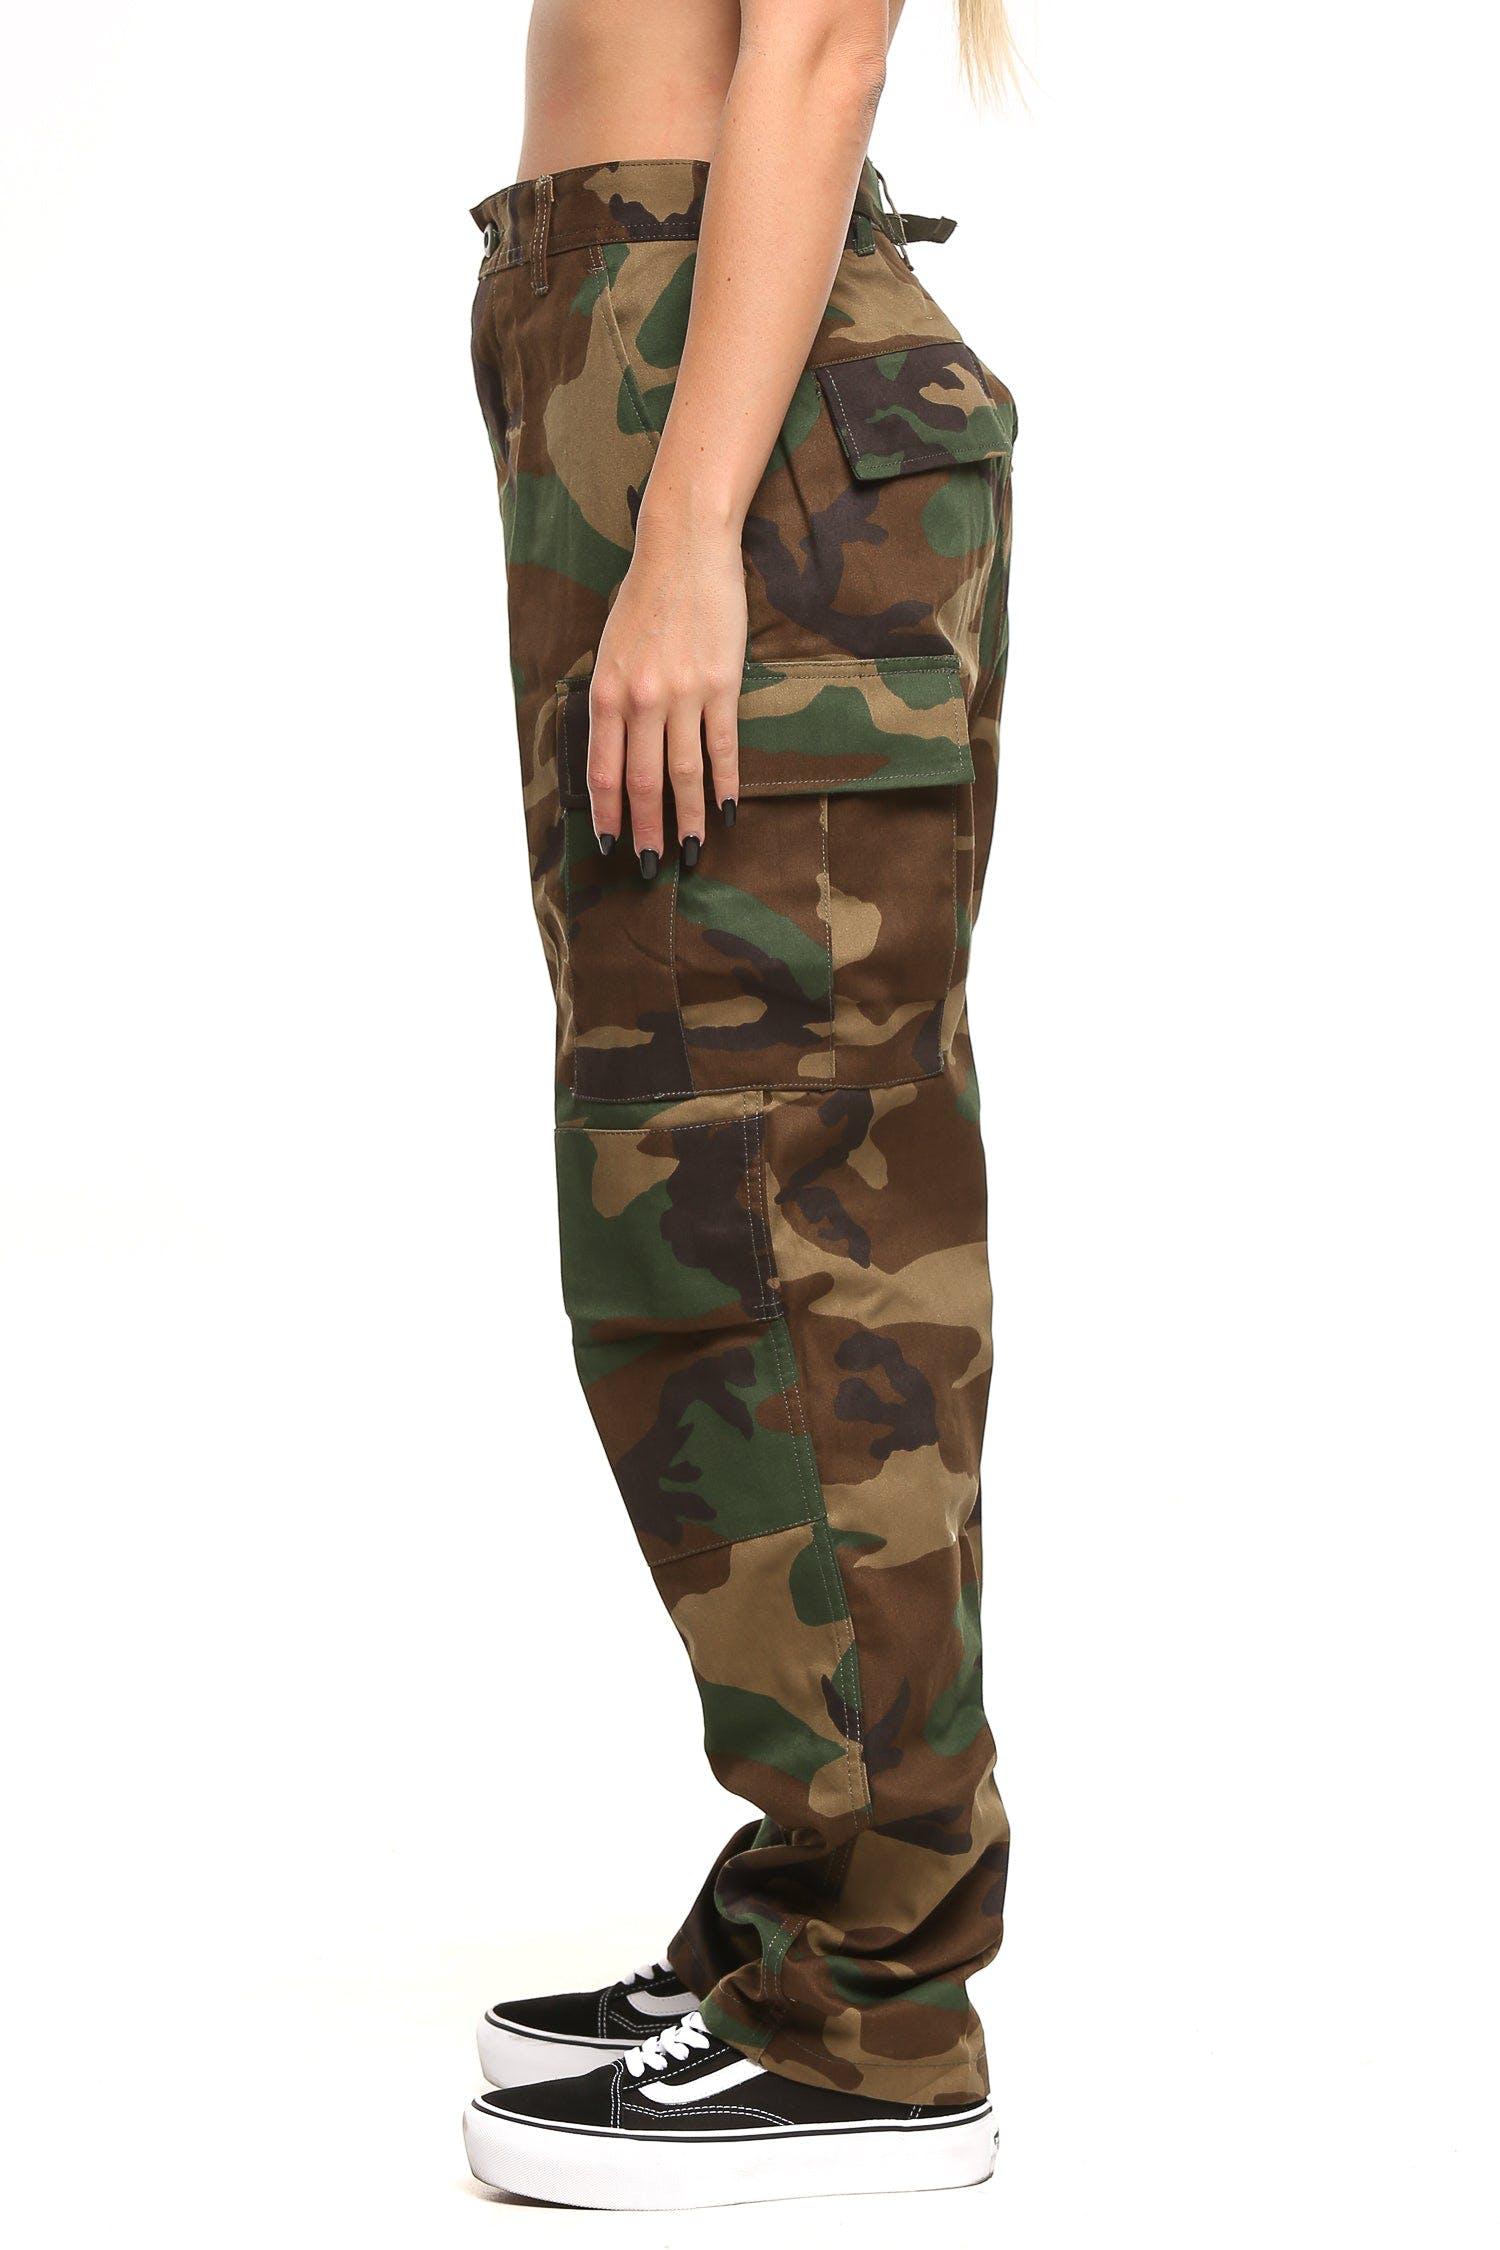 Rothco Womens Tactical BDU Pant City Camo - Culture Kings